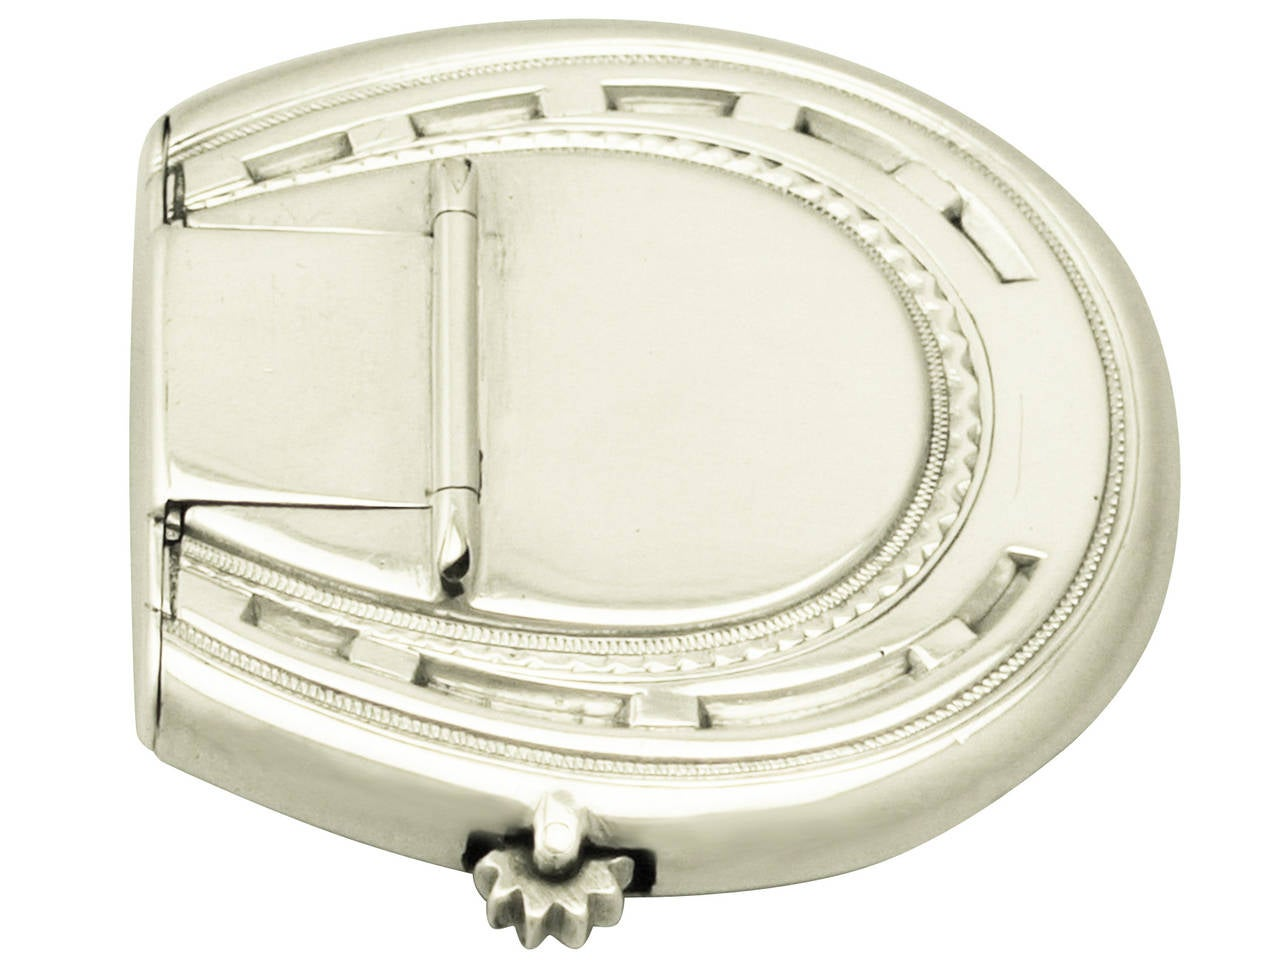 Sterling silver horseshoe vesta case antique victorian for Vintage horseshoes for sale